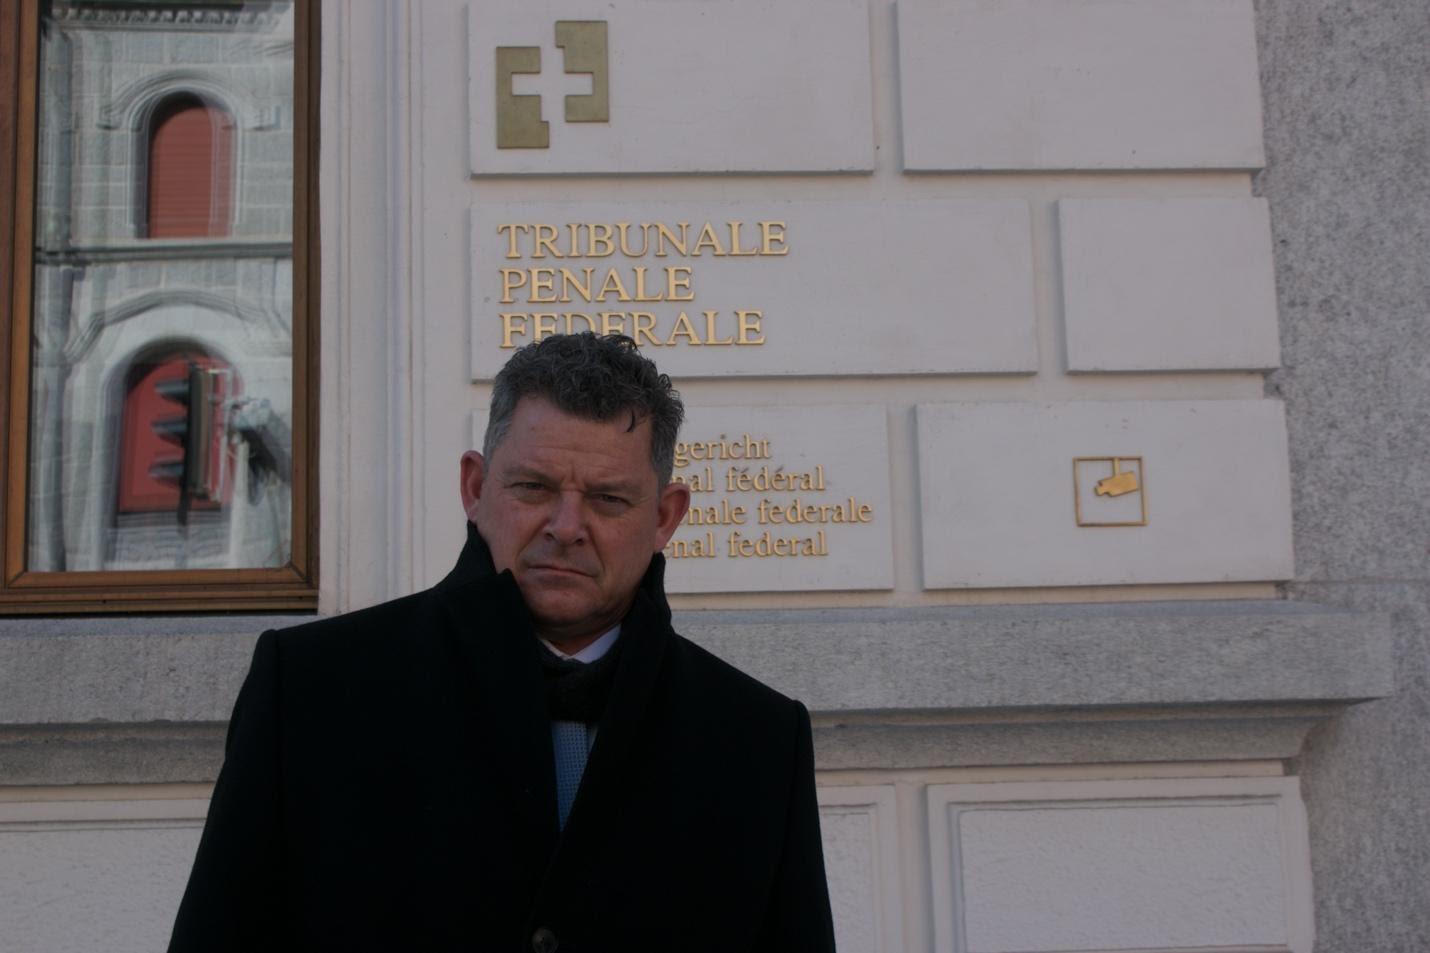 Alieu Kosiah's lawyer Dmitri Gianoli. New Narratives/James Harding Giahyue